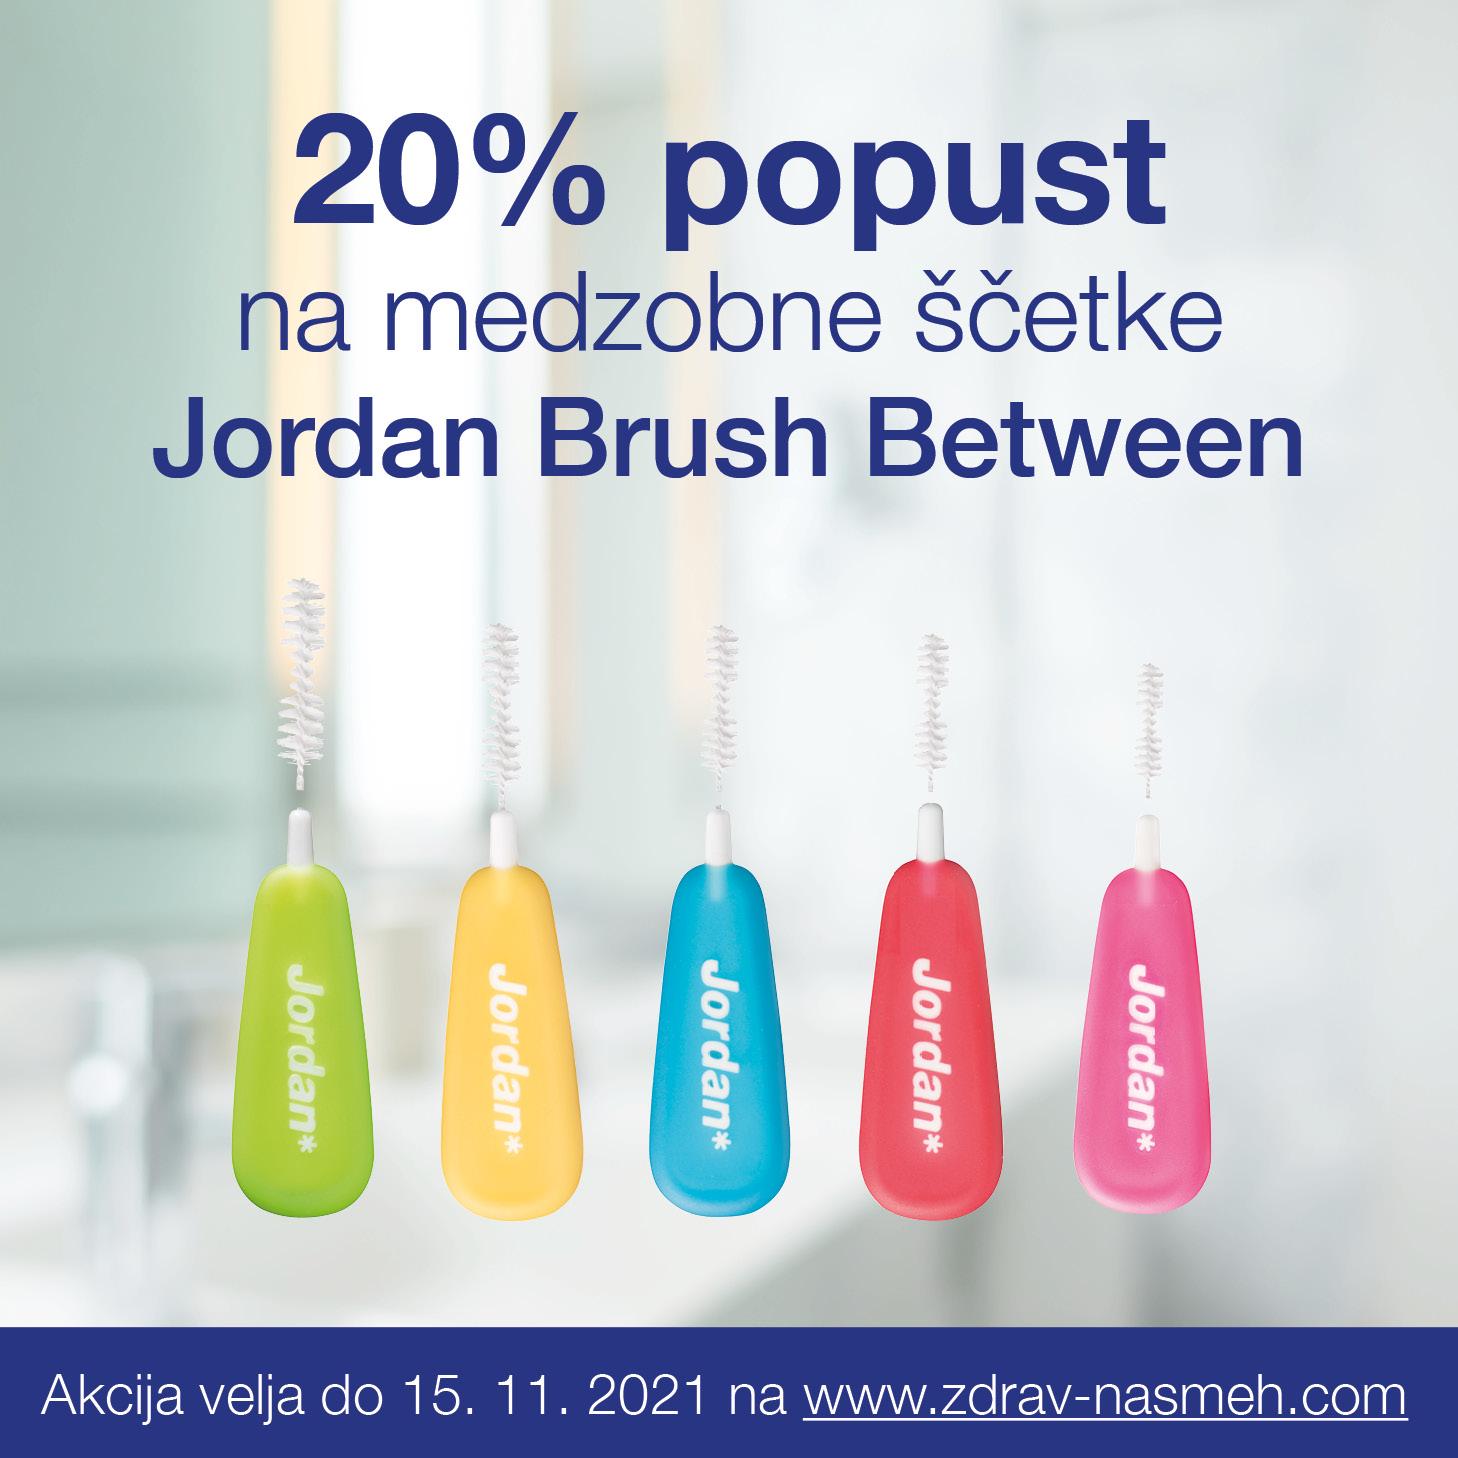 Jordan Brush Between -20% popust